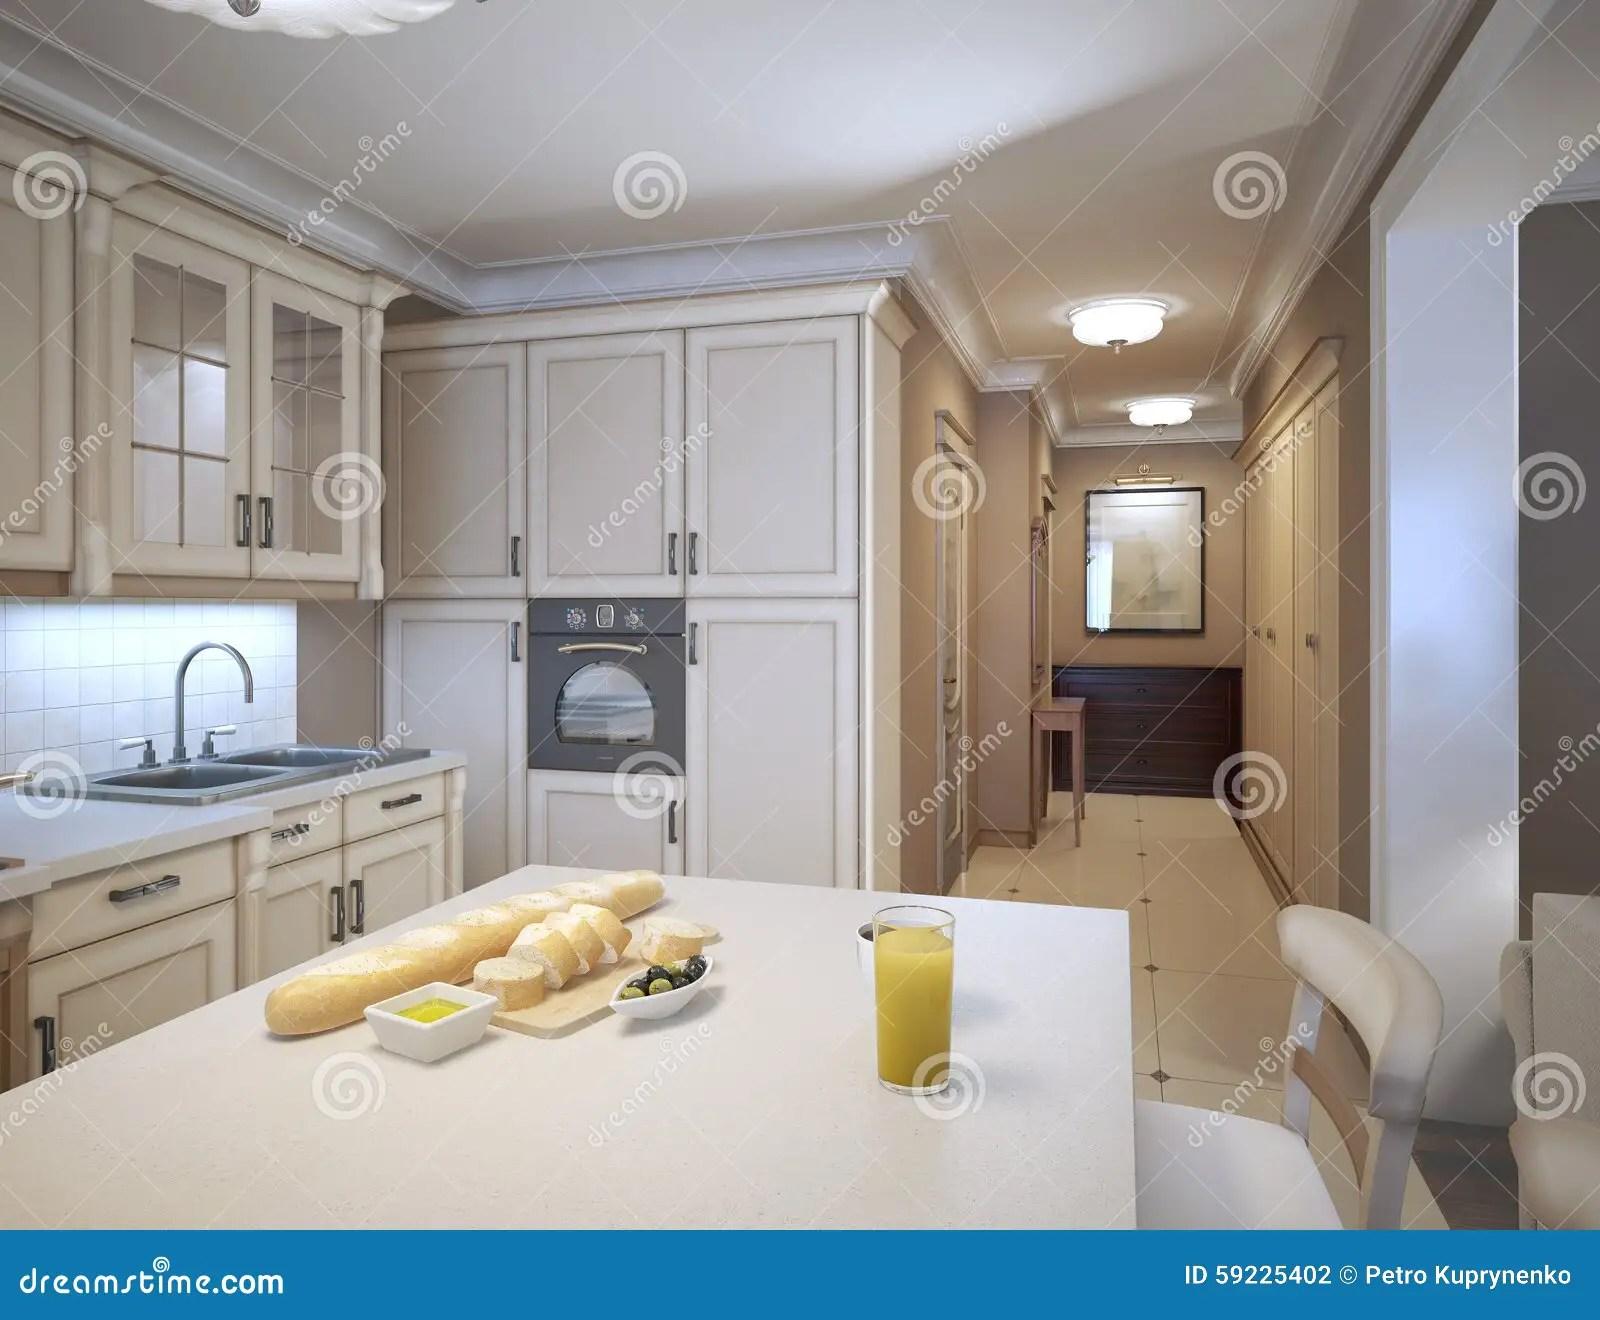 White Kitchen Art Deco Style Stock Illustration  Image